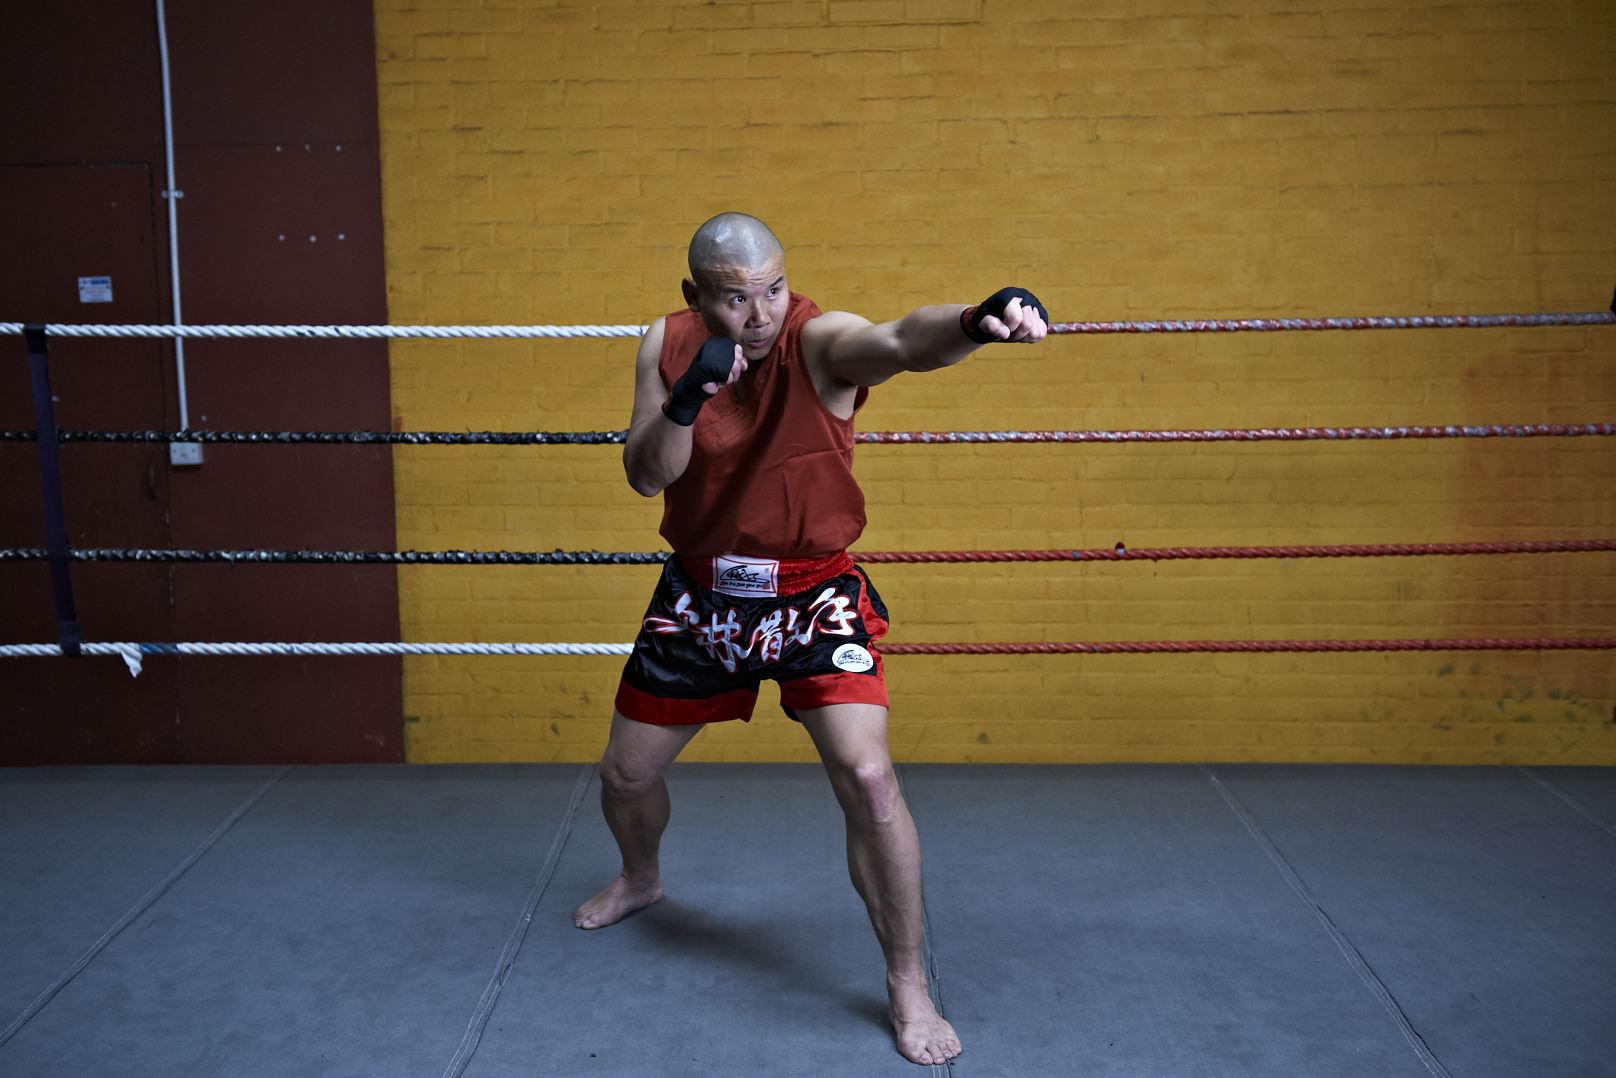 Shaolin temple uk shifu yanzi kick 28.jpg